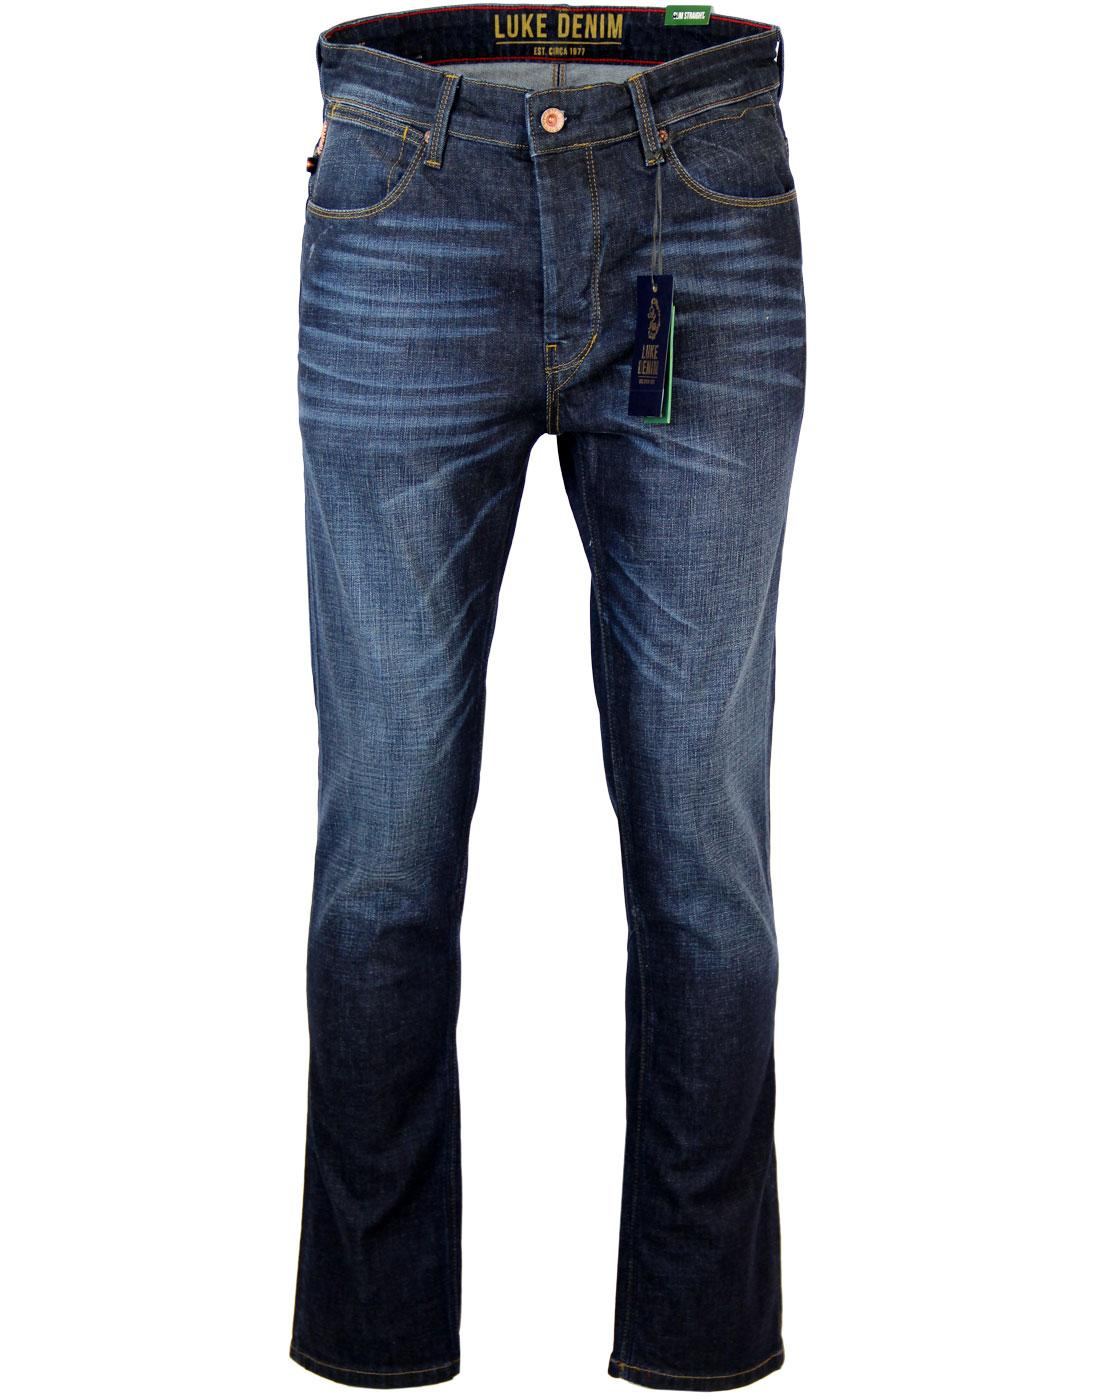 Freddie LUKE 1977 Slim Straight 5 Pocket Jeans